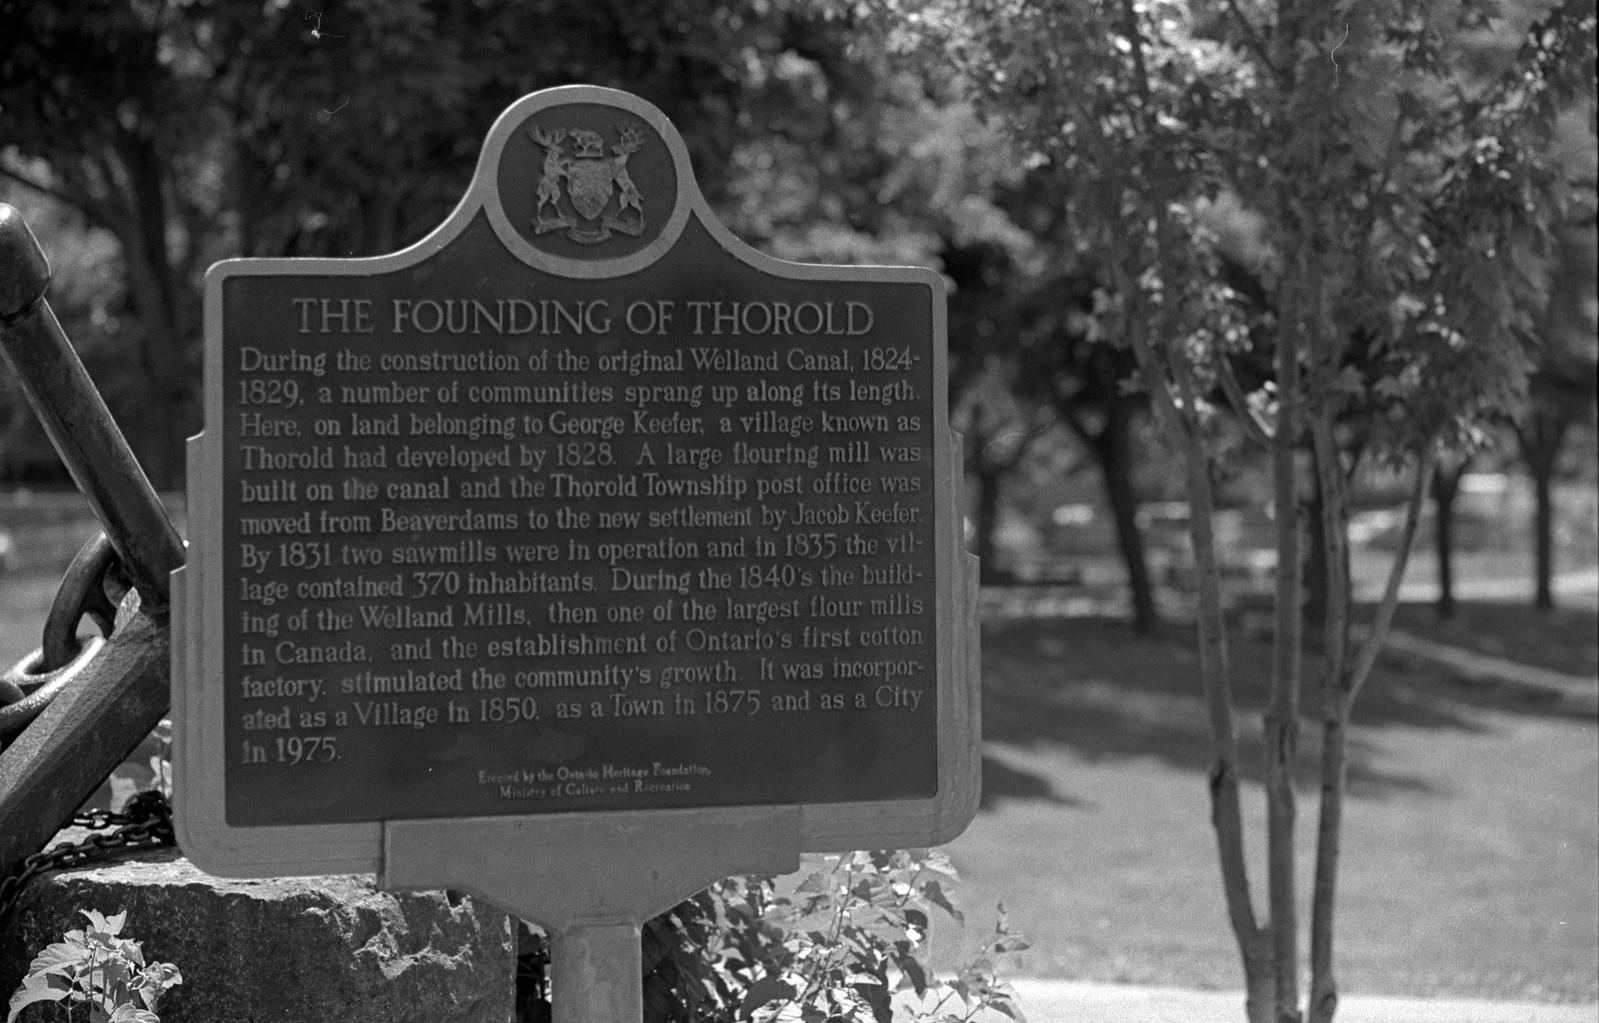 Founding of Thorold